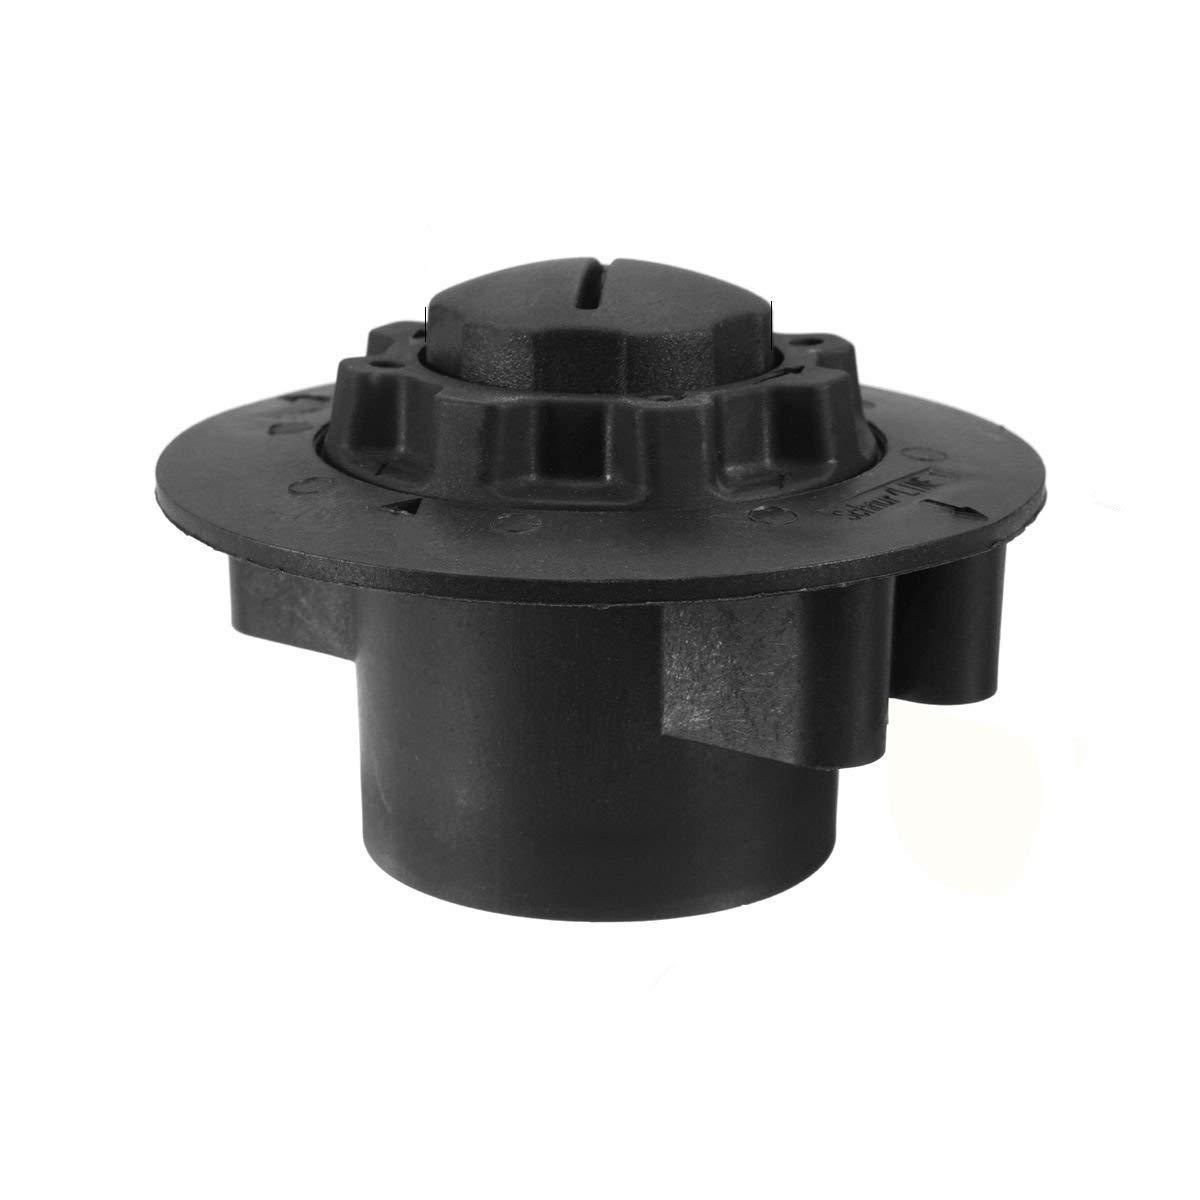 Amazon.com: Euros String Trimmer Head For Stihl Autocut C5-2 FS38 FS40 FS45  FS46 FS45C FS50 FSE60 5-2: Garden & Outdoor